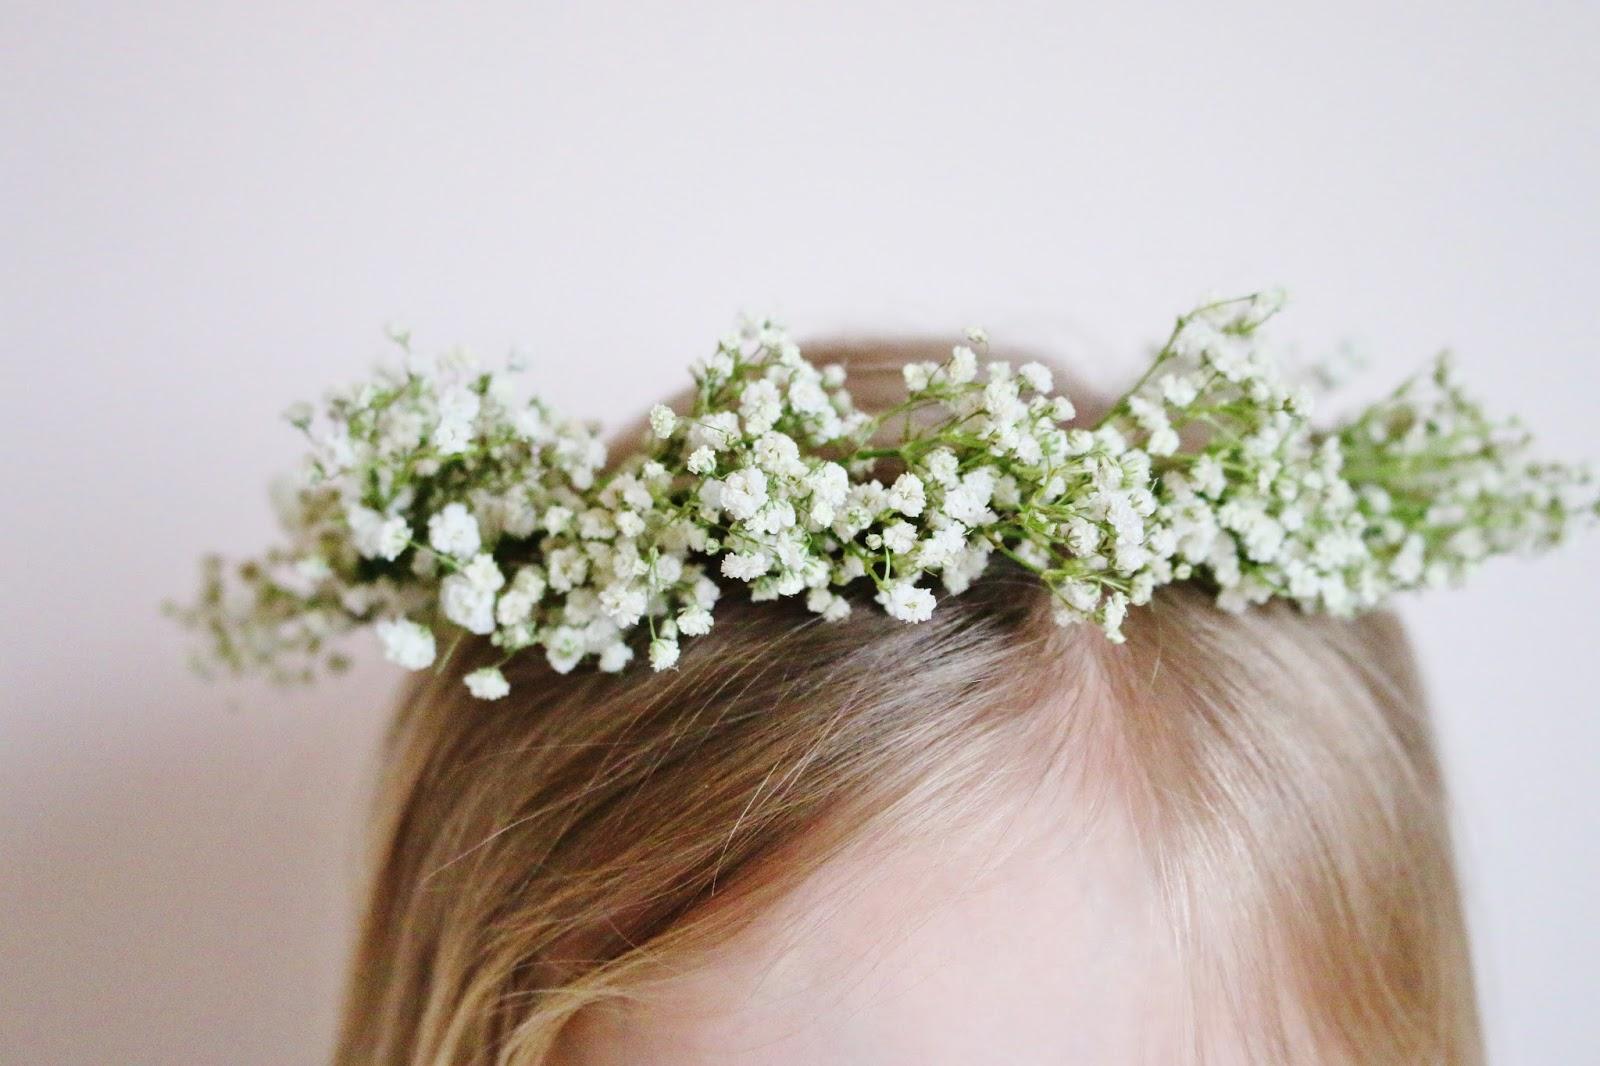 My Simple Modest Chic Diy Babys Breath Flower Crown Tutorial